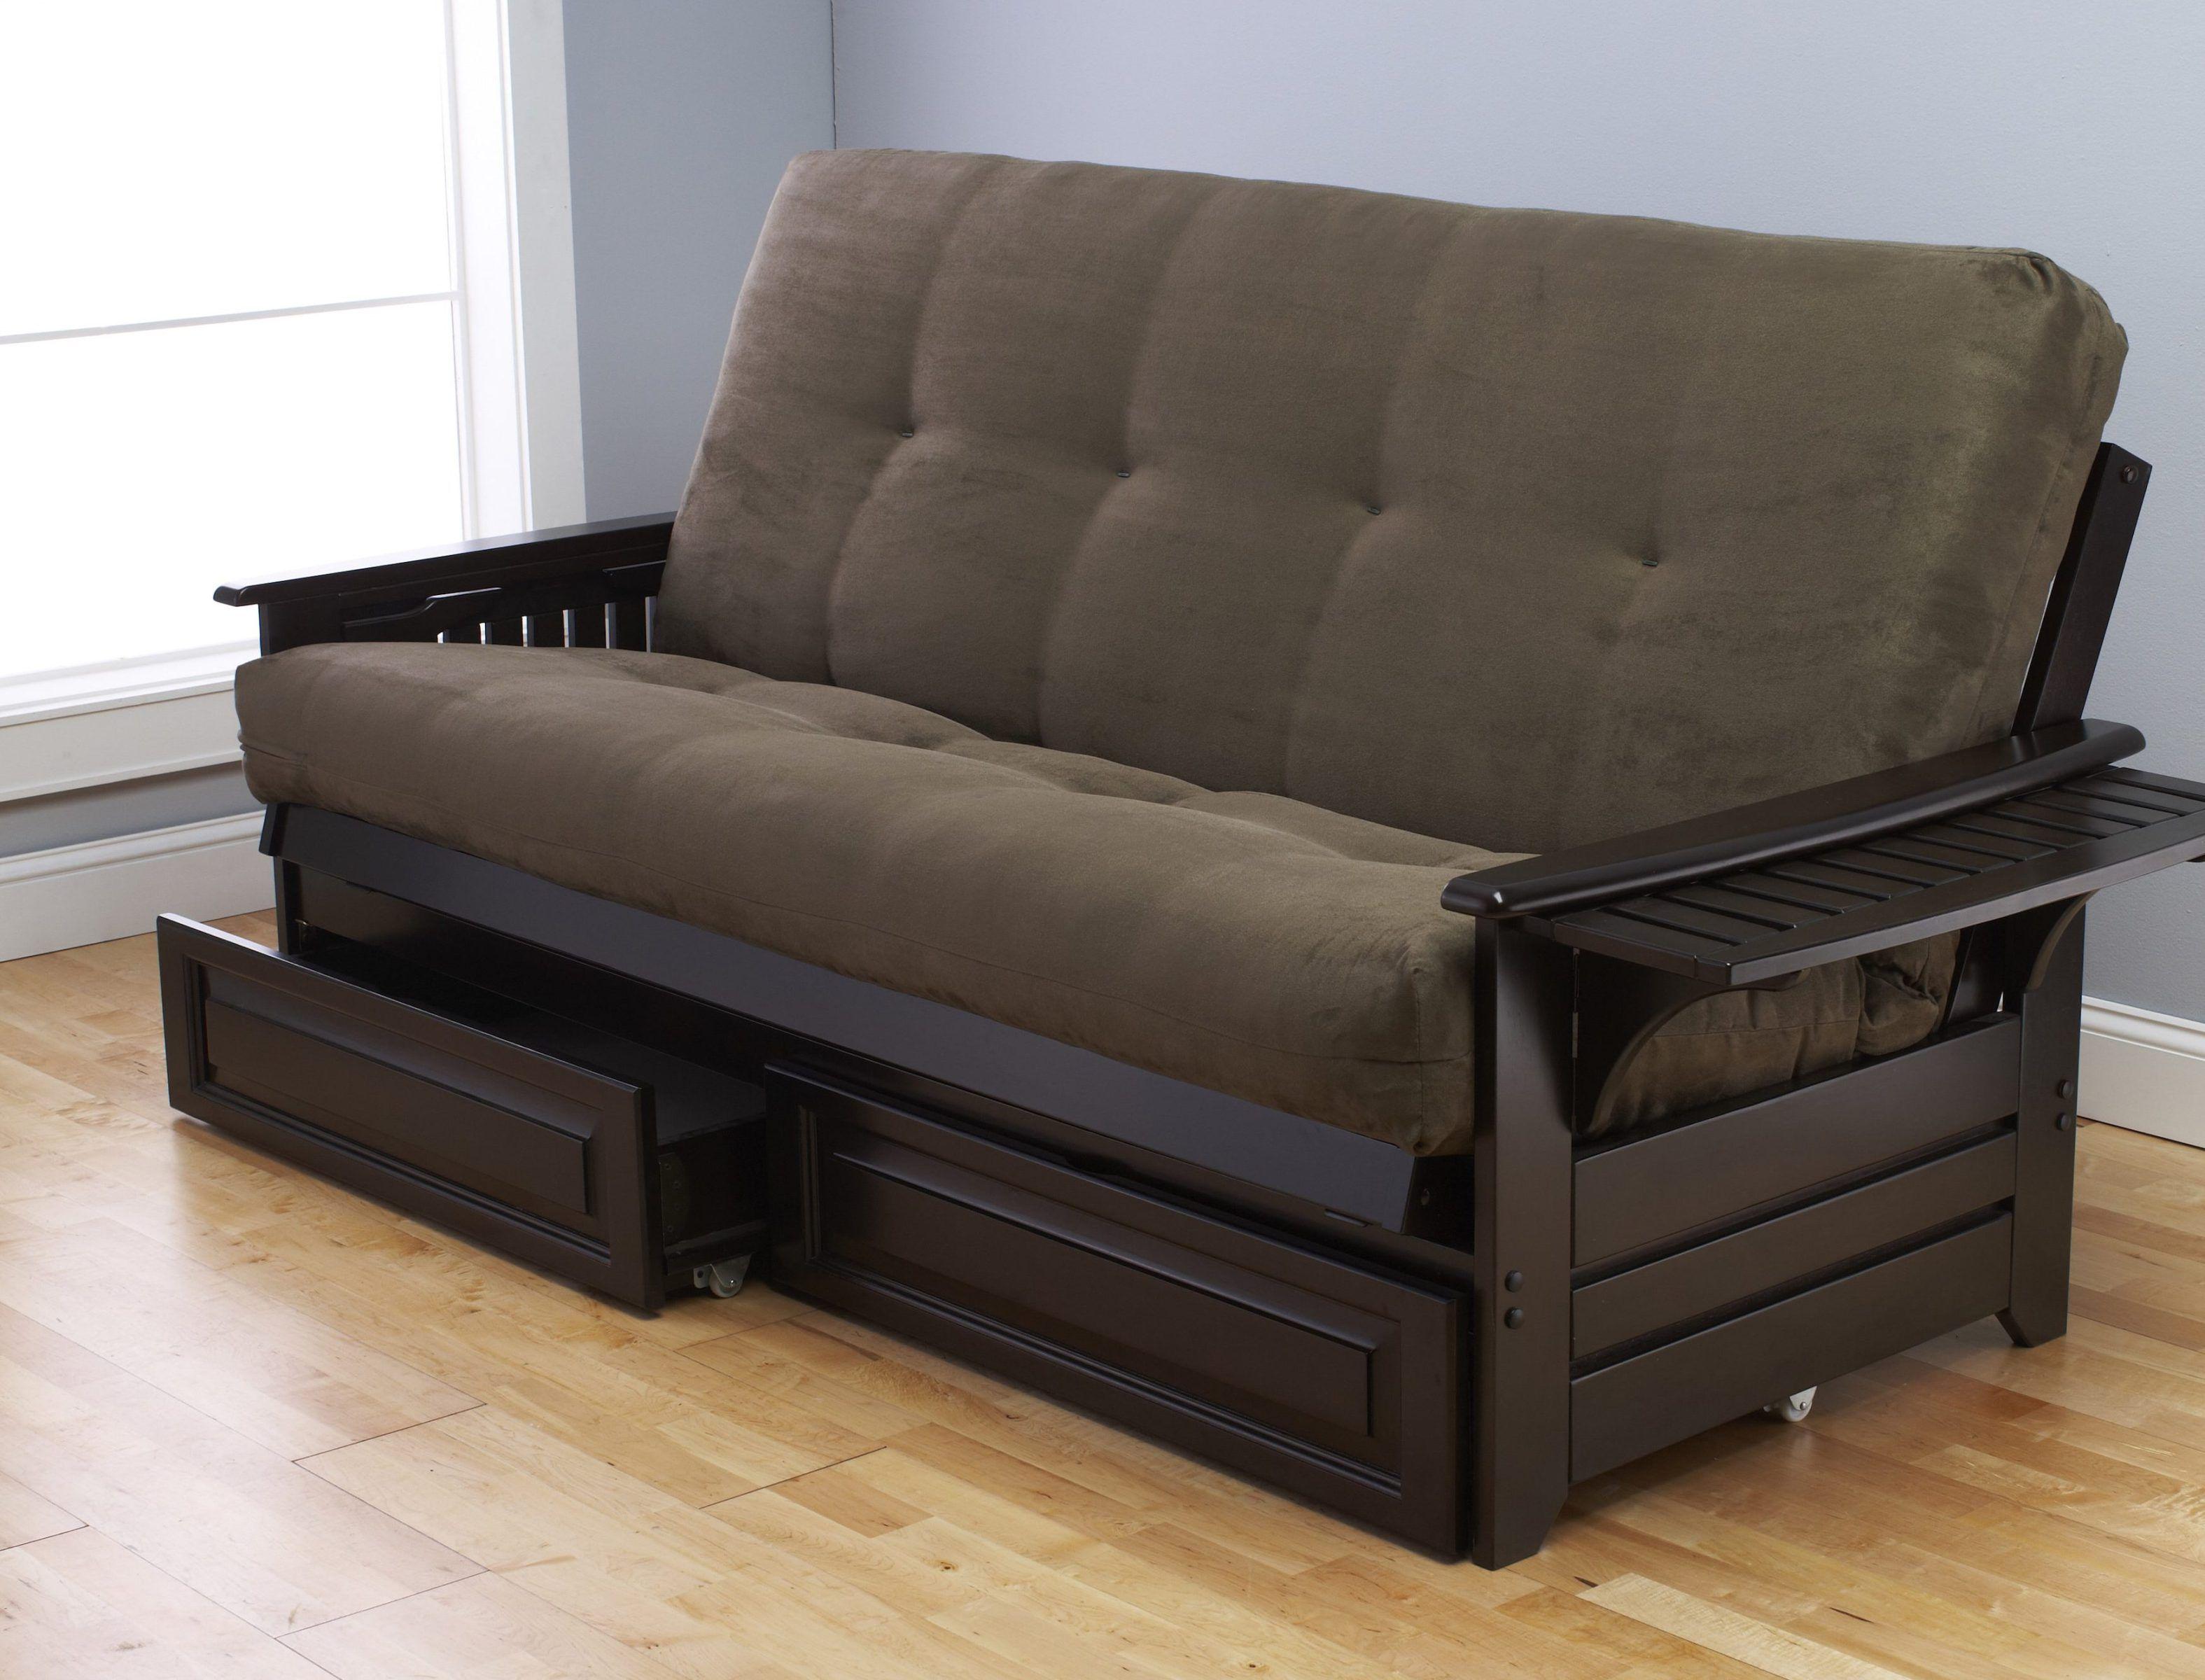 Prime 11 Space Saving Sleeper Sofas Futon Sets Futon Sofa Evergreenethics Interior Chair Design Evergreenethicsorg